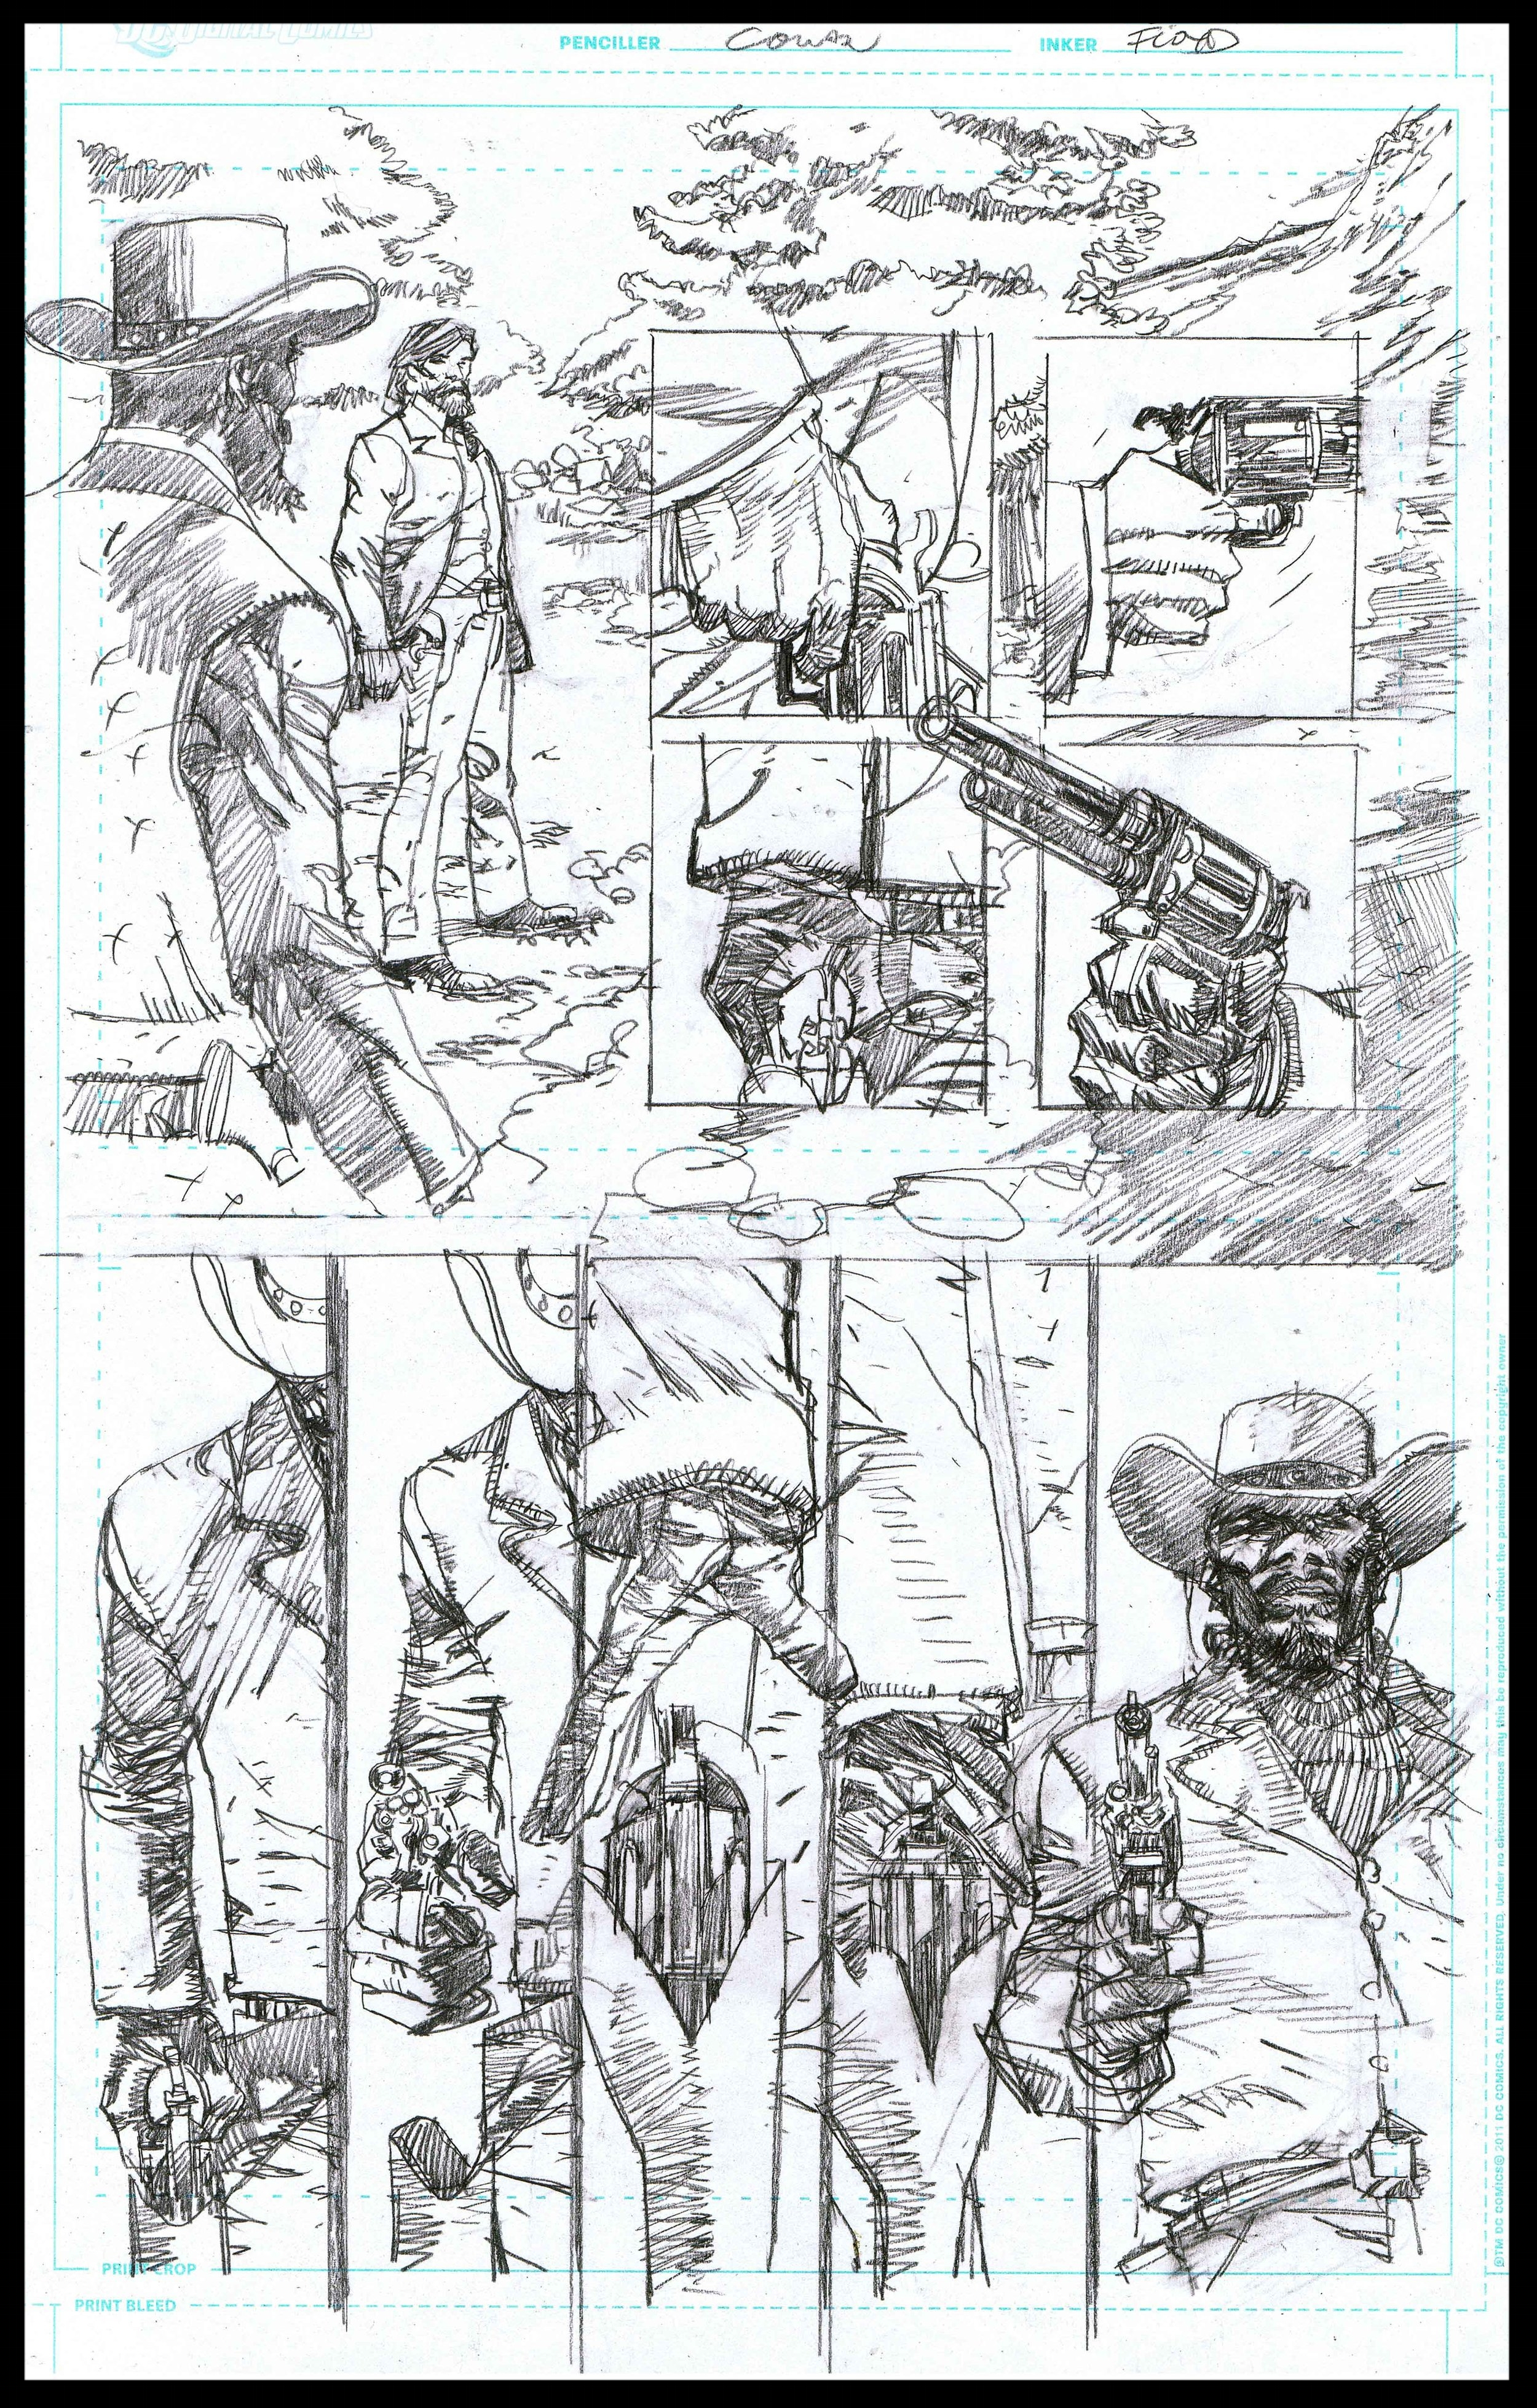 Django Unchained #3 - Page 7 - Pencils